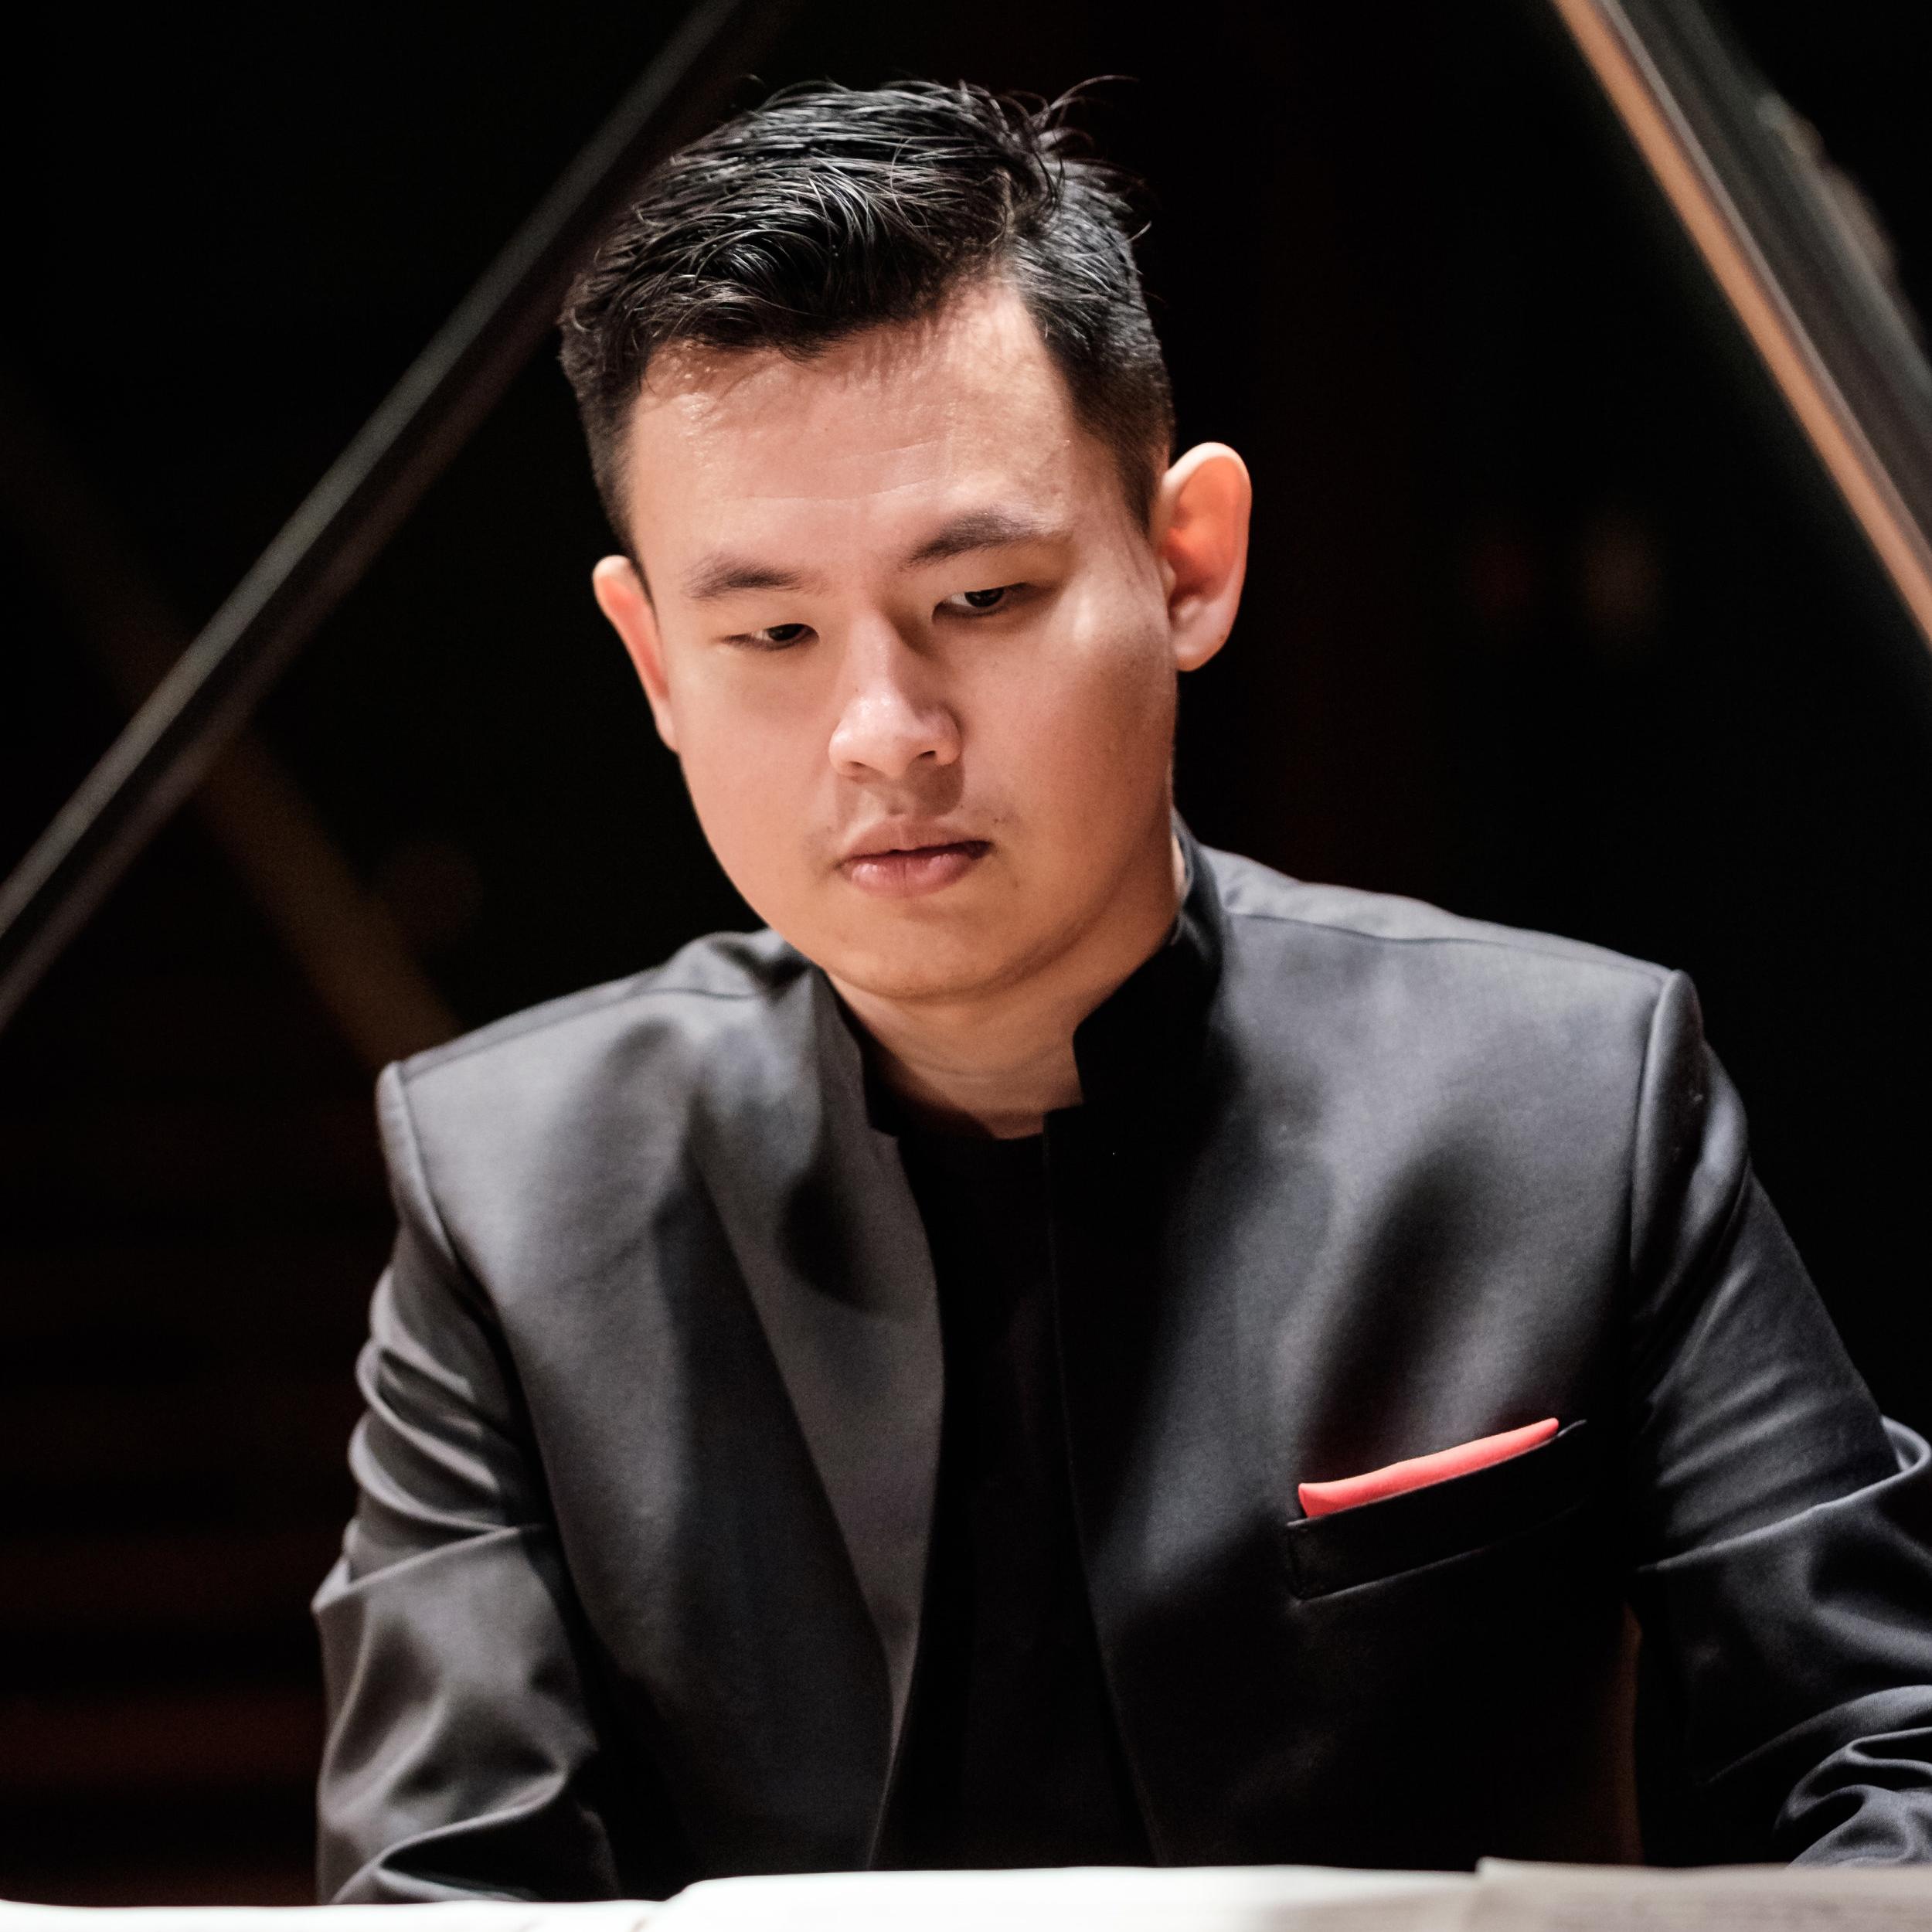 Gerald LIM - Harpsichord,  Ensemble Manager